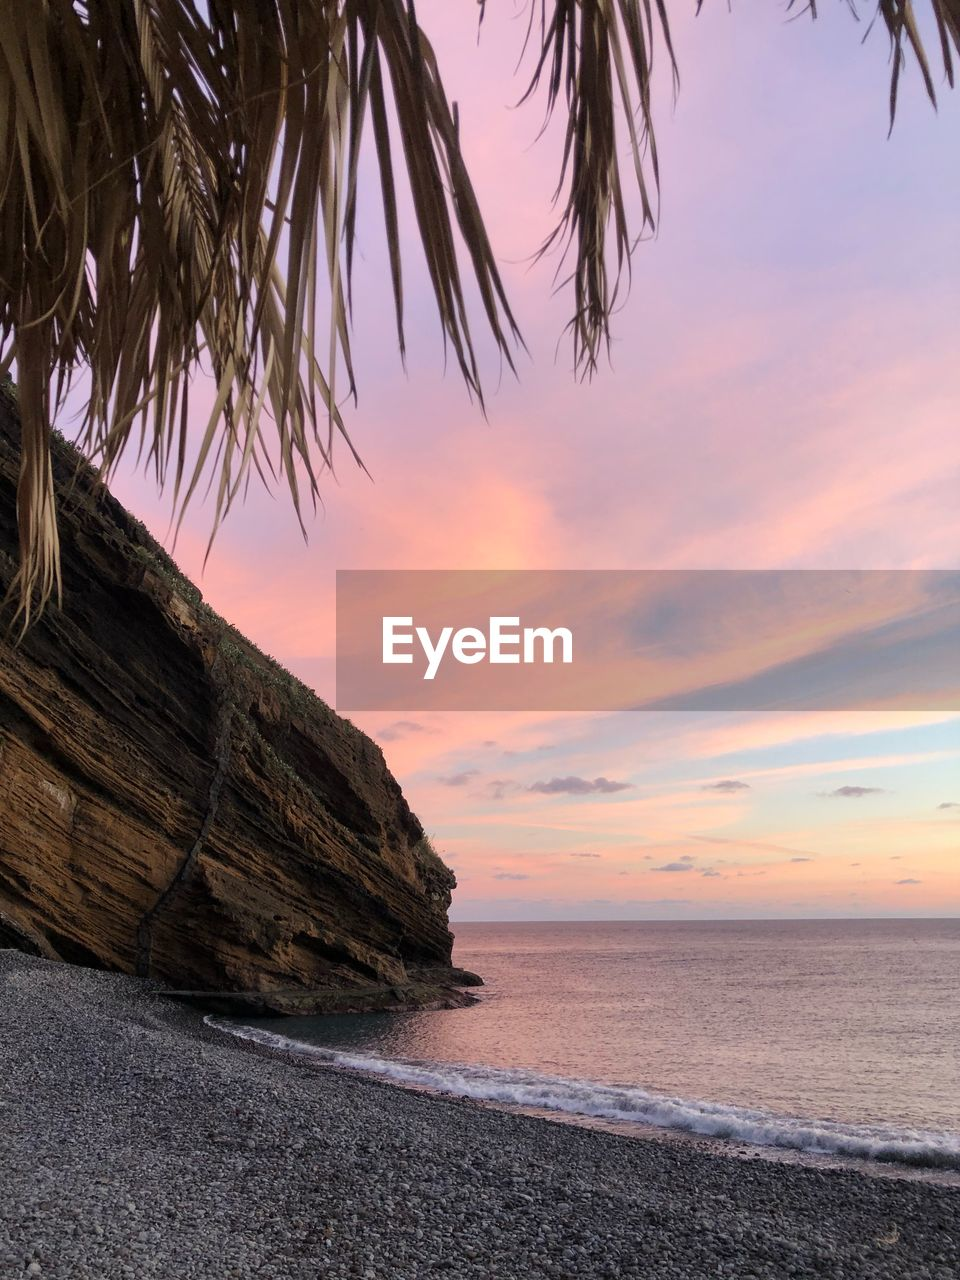 sky, sea, water, sunset, beauty in nature, beach, tranquil scene, scenics - nature, horizon over water, tranquility, land, horizon, no people, idyllic, cloud - sky, nature, non-urban scene, tree, sand, palm leaf